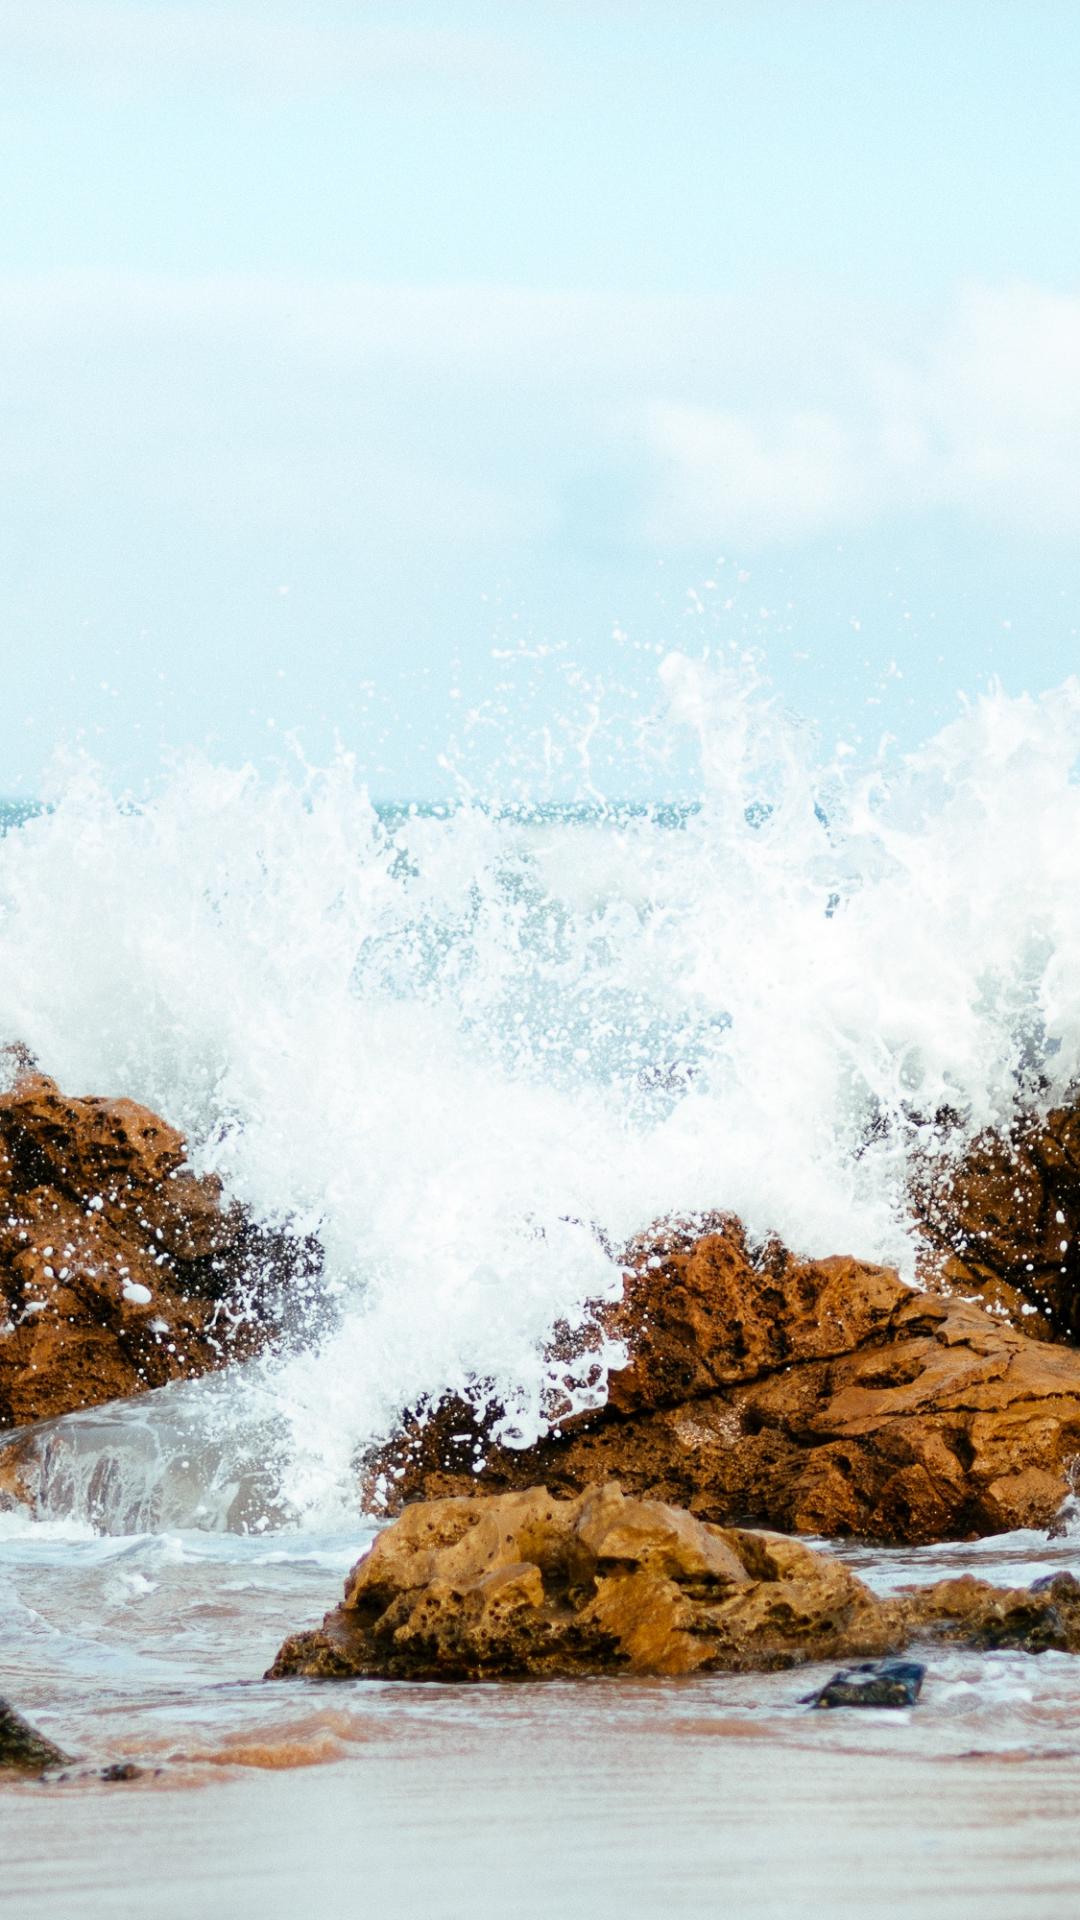 Splash And Spray iPhone Wallpaper